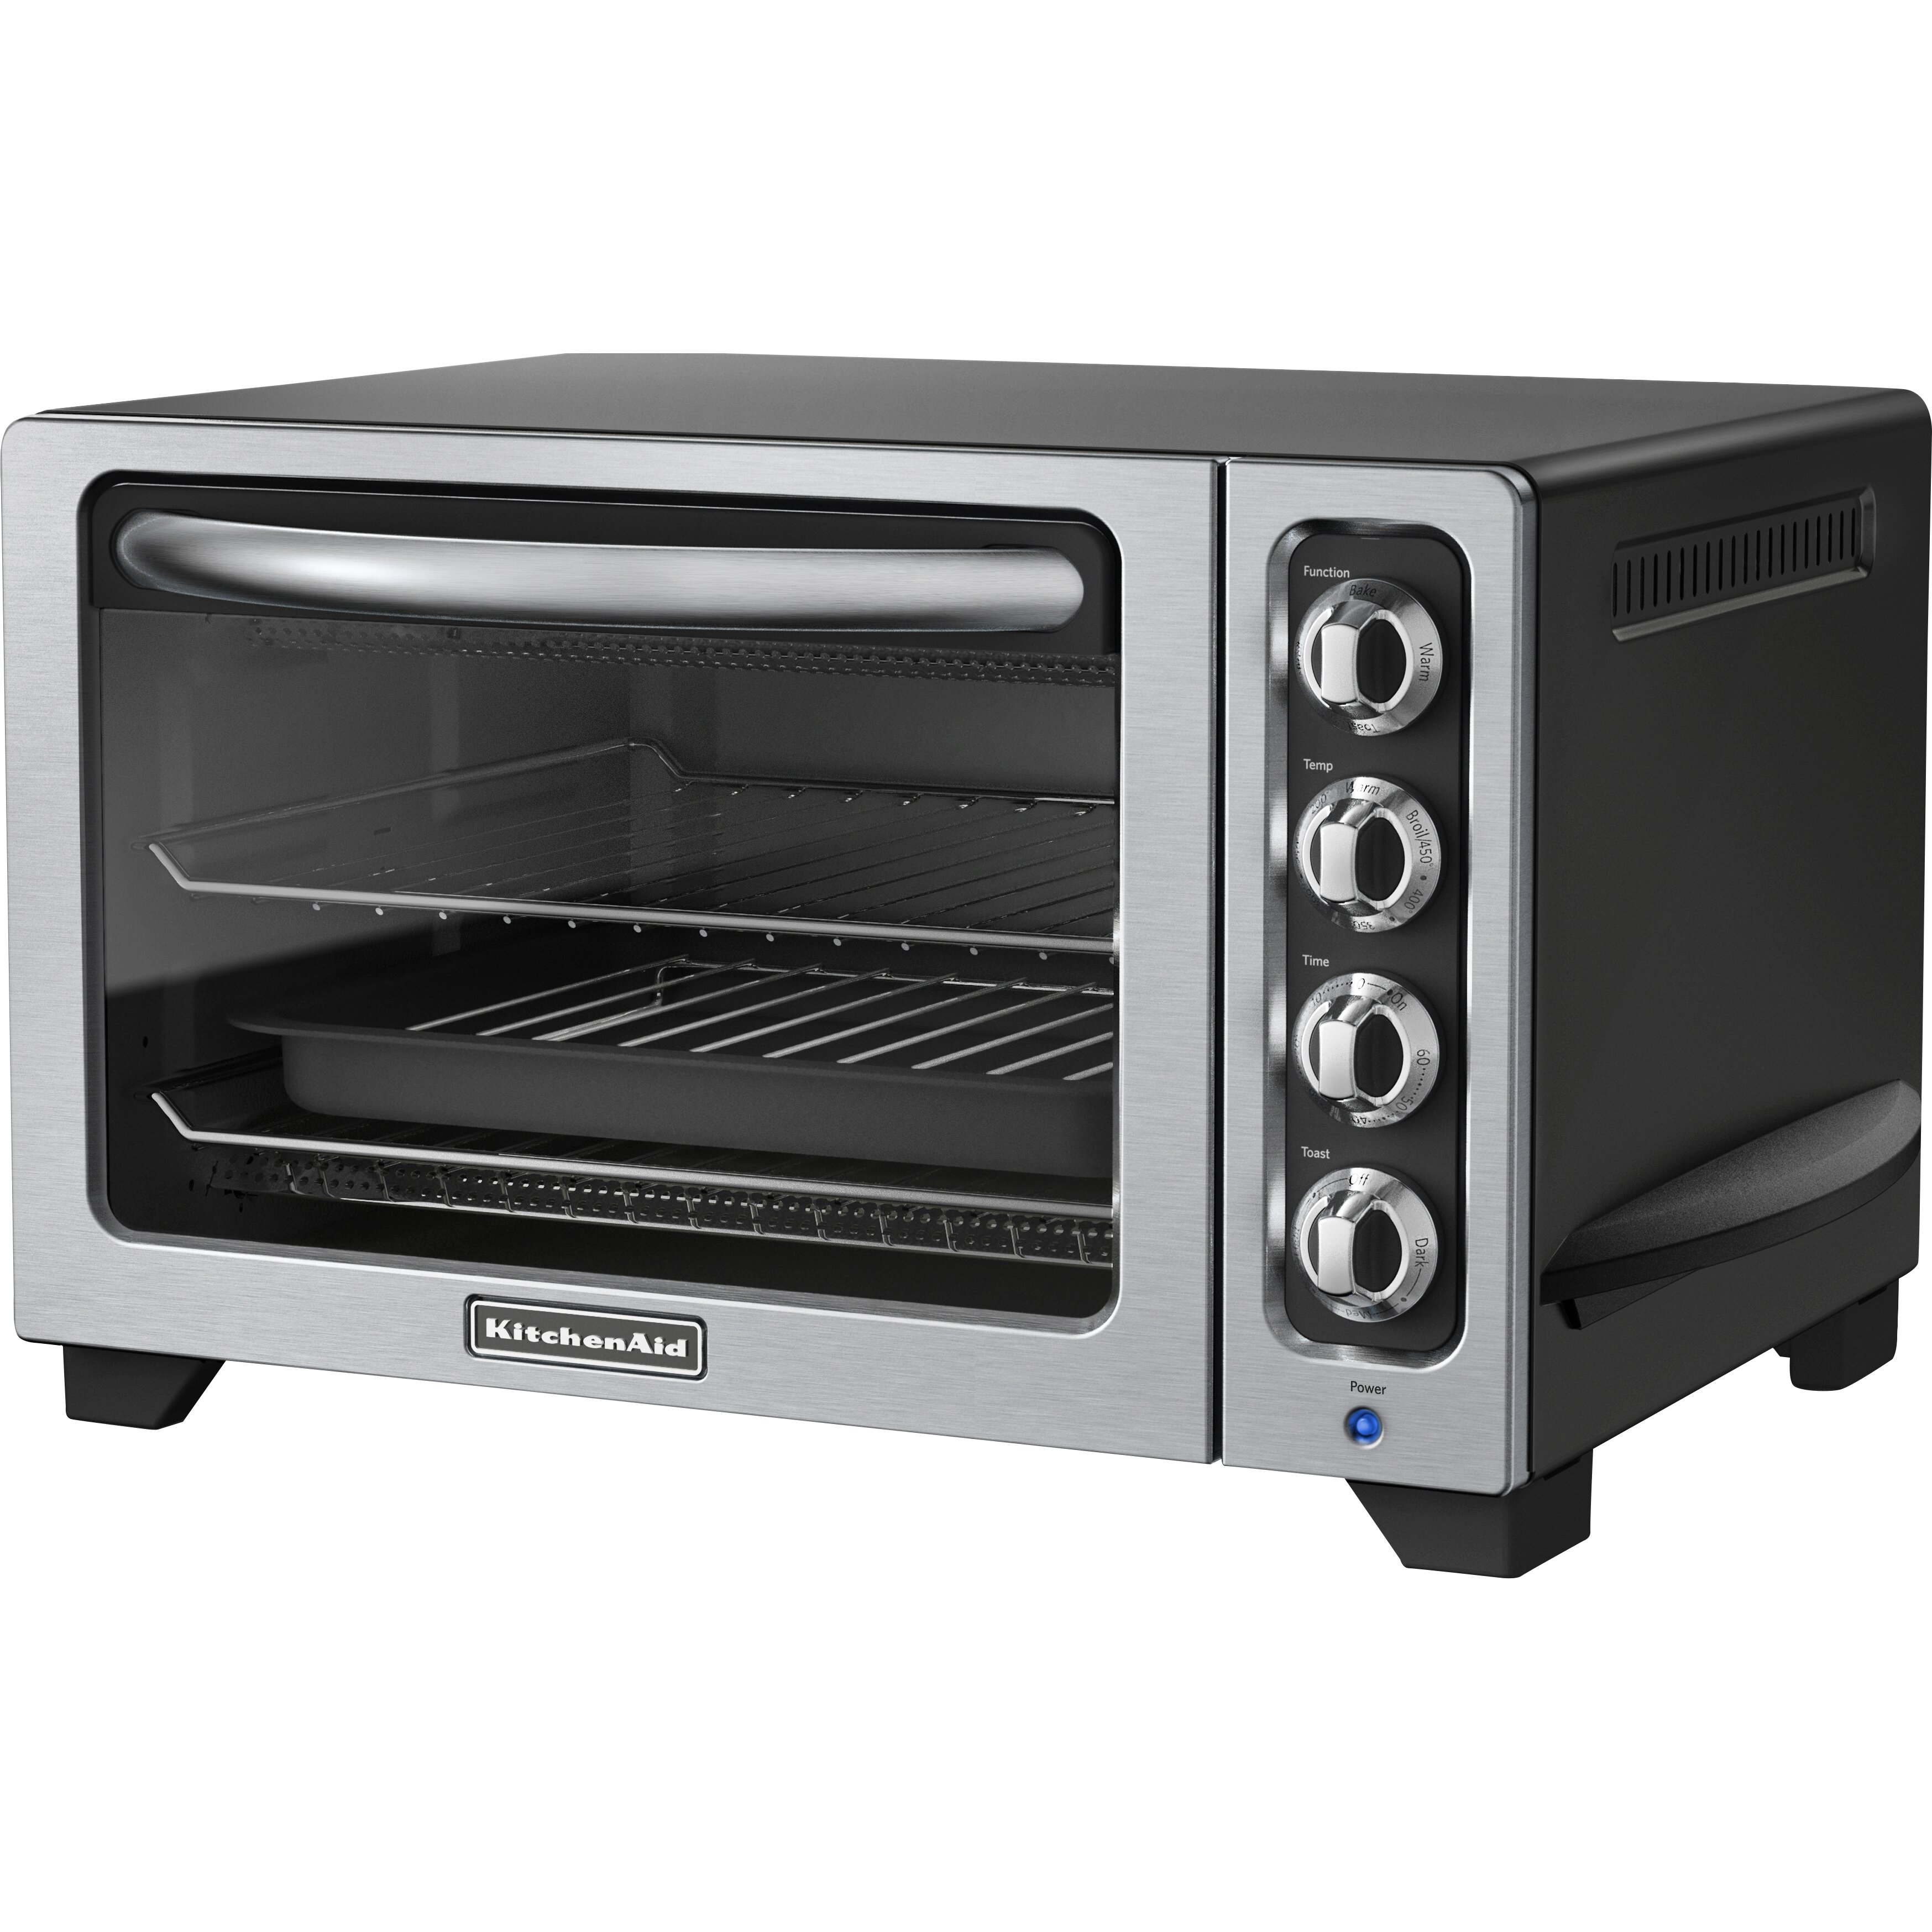 Countertop Oven Kitchenaid : Countertop Toaster Oven by KitchenAid